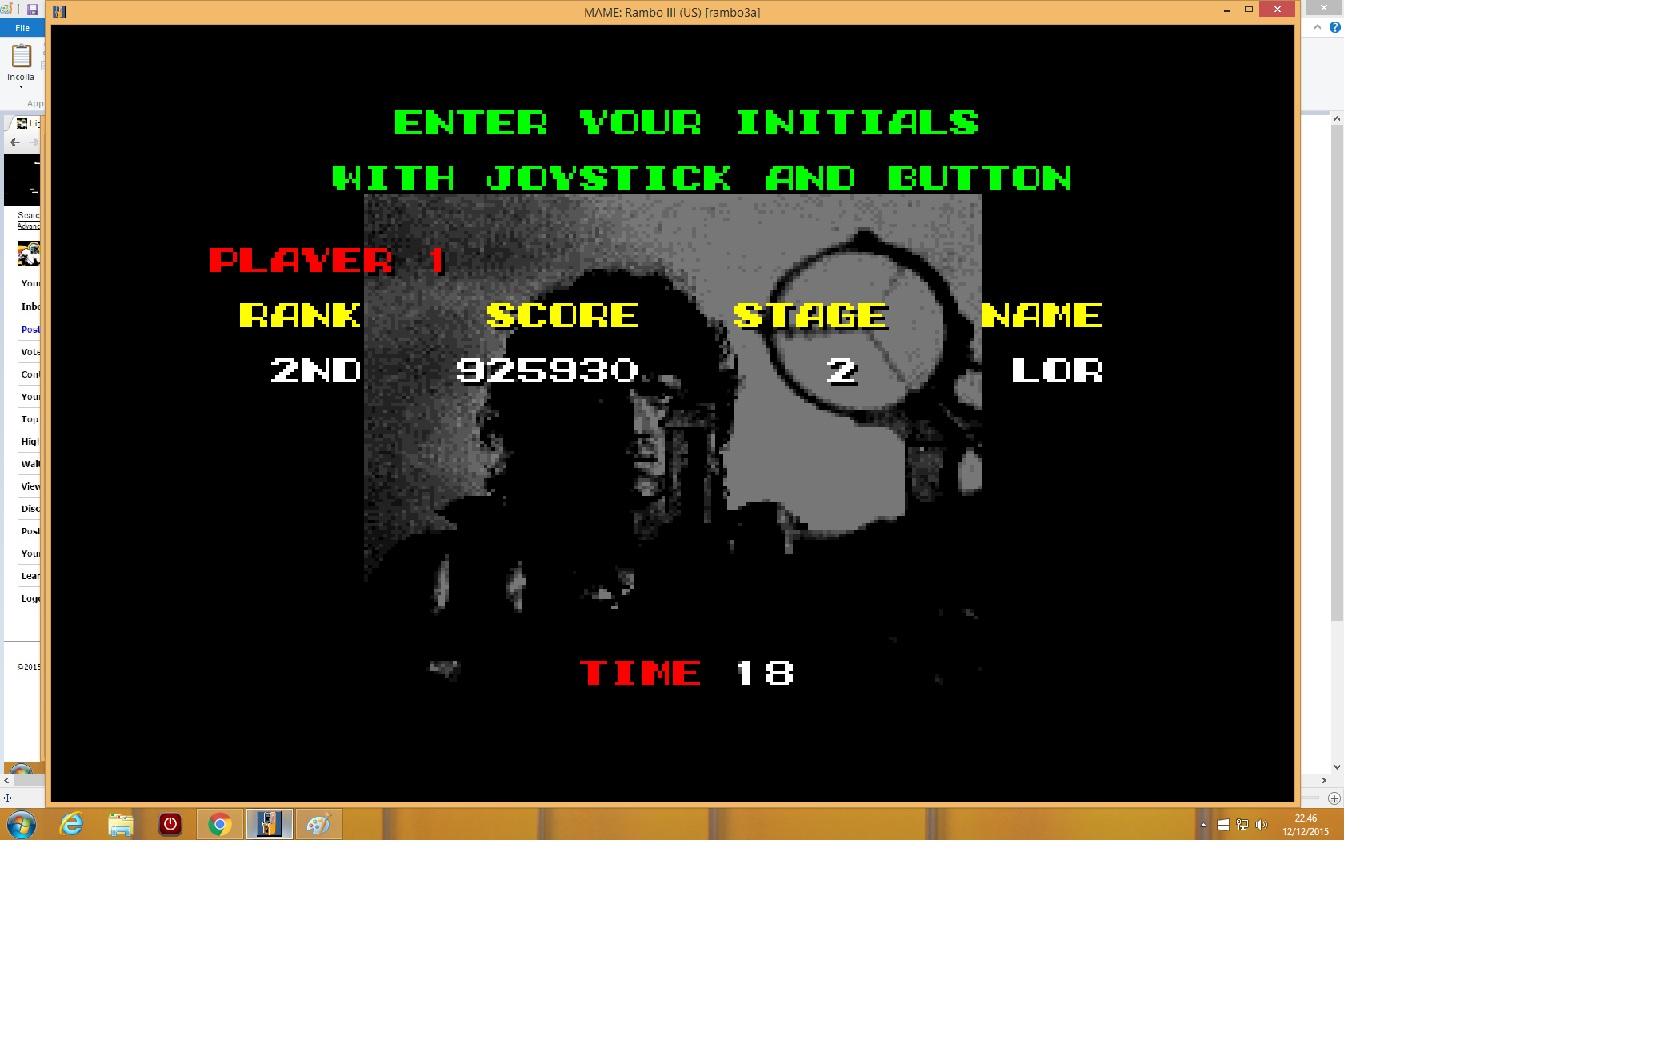 lenny2571: Rambo III (Arcade Emulated / M.A.M.E.) 925,930 points on 2015-12-12 15:45:45